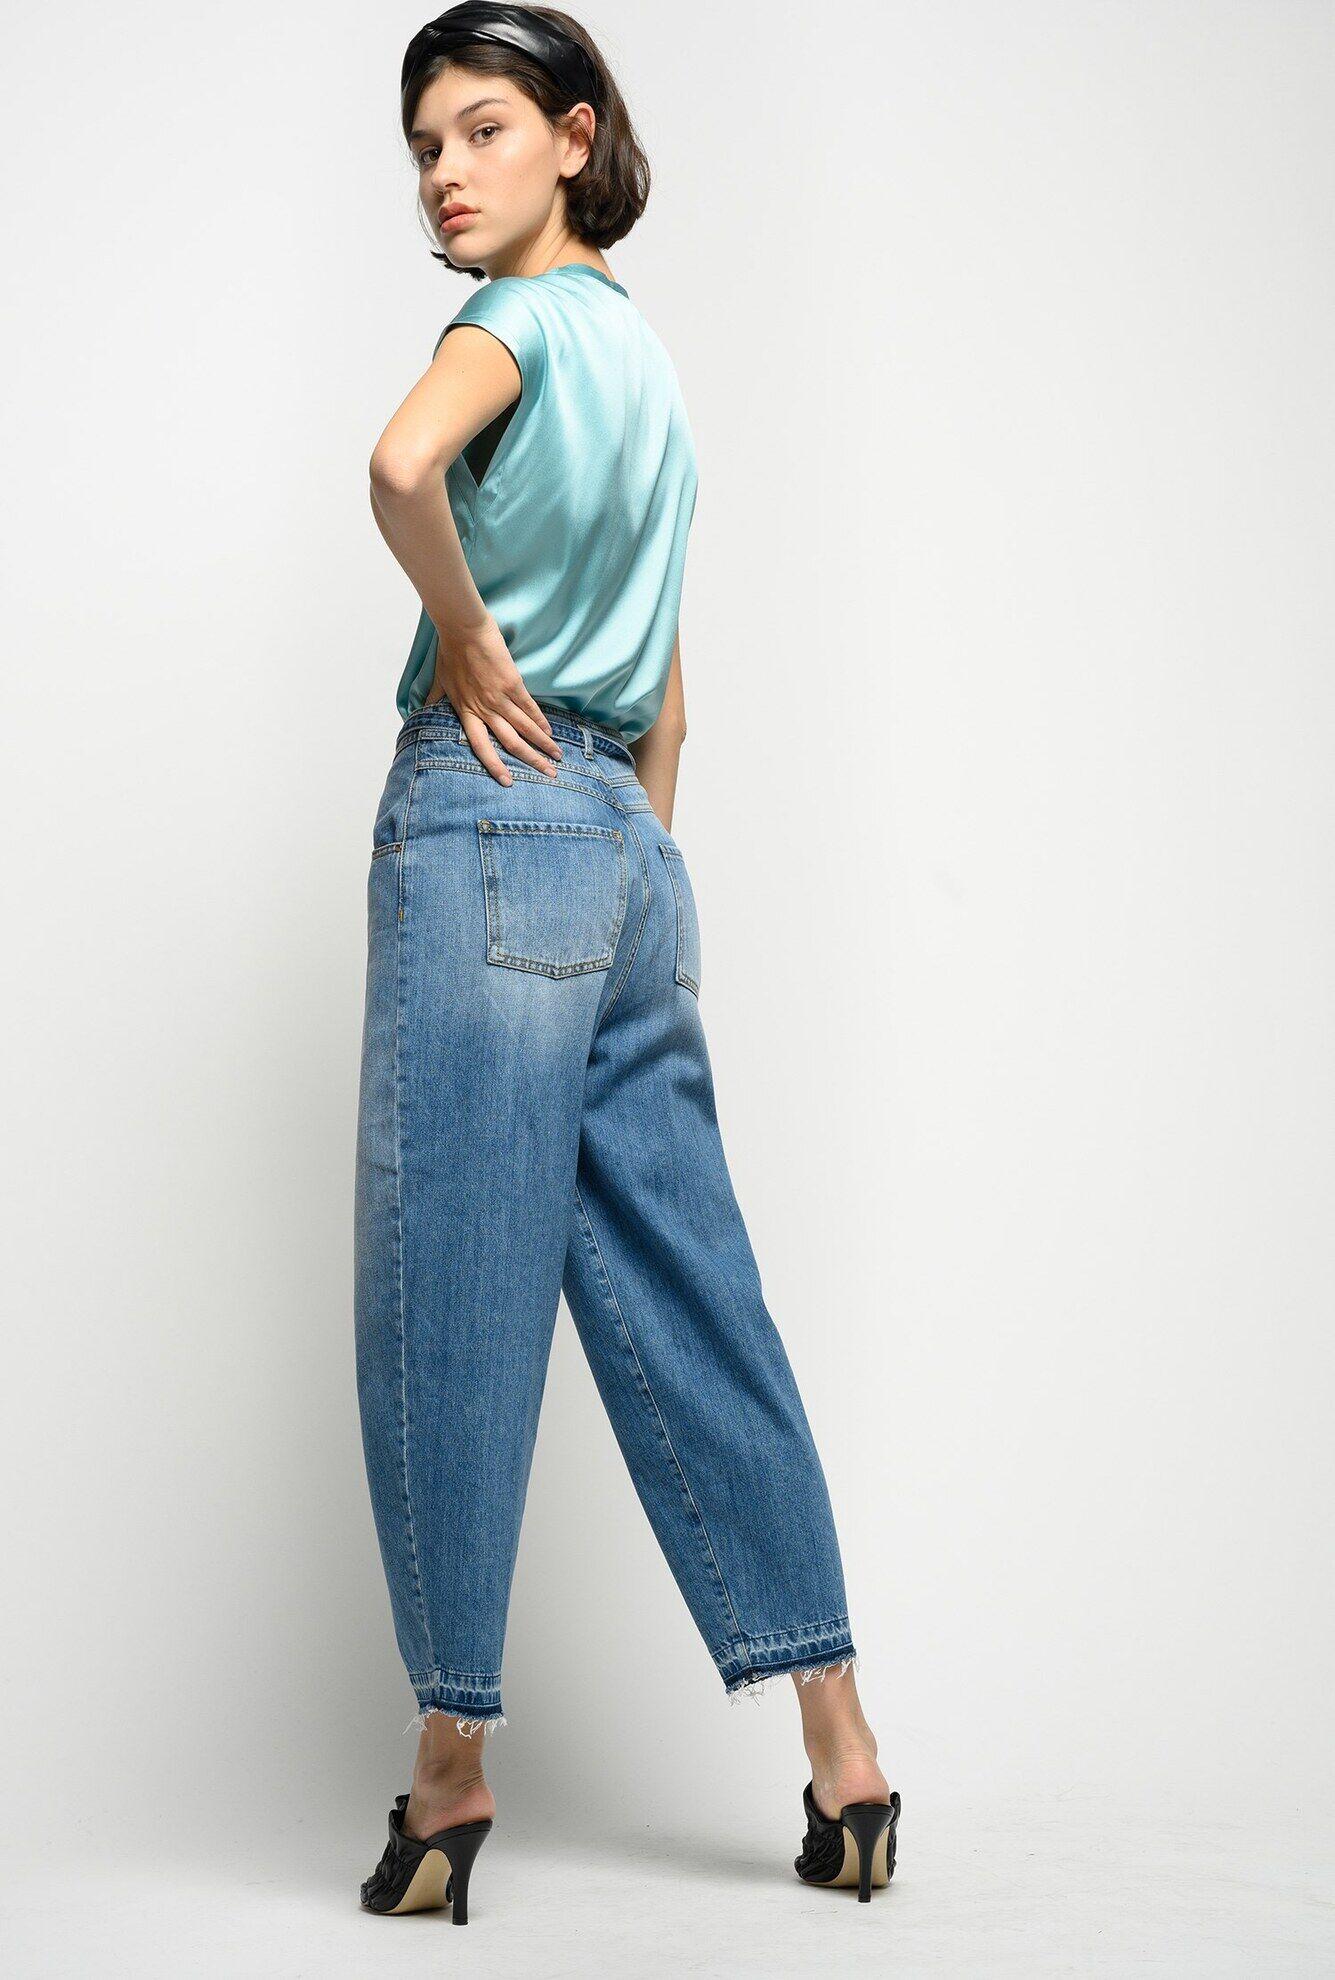 Jeans Slouchy In Denim Vintage - Pinko